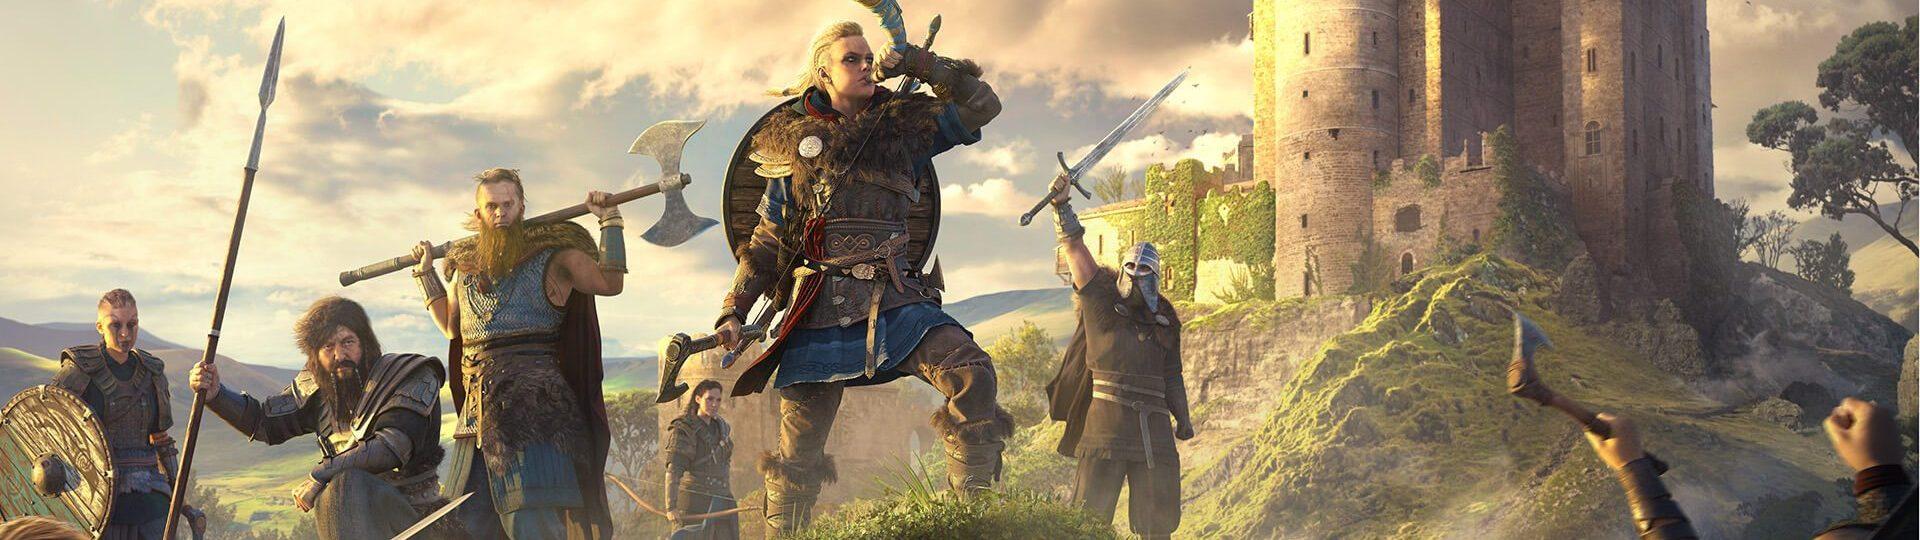 Ubisoft Forward: Assassin's Creed Valhalla Hands-On